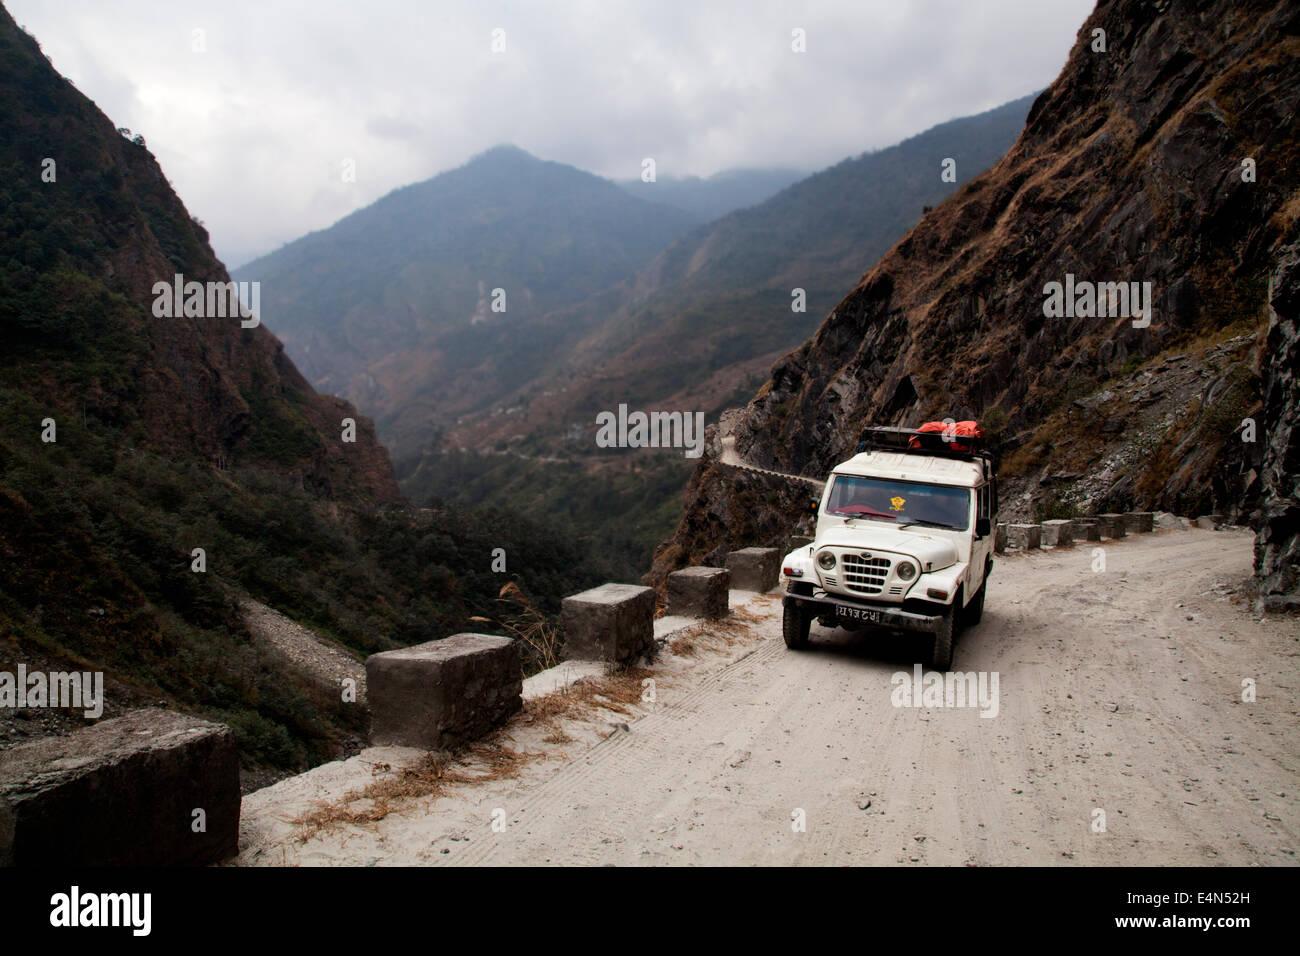 Jeep on the Tatopani to Jomsom road, Himalayas, Annapurna, Nepal - Stock Image